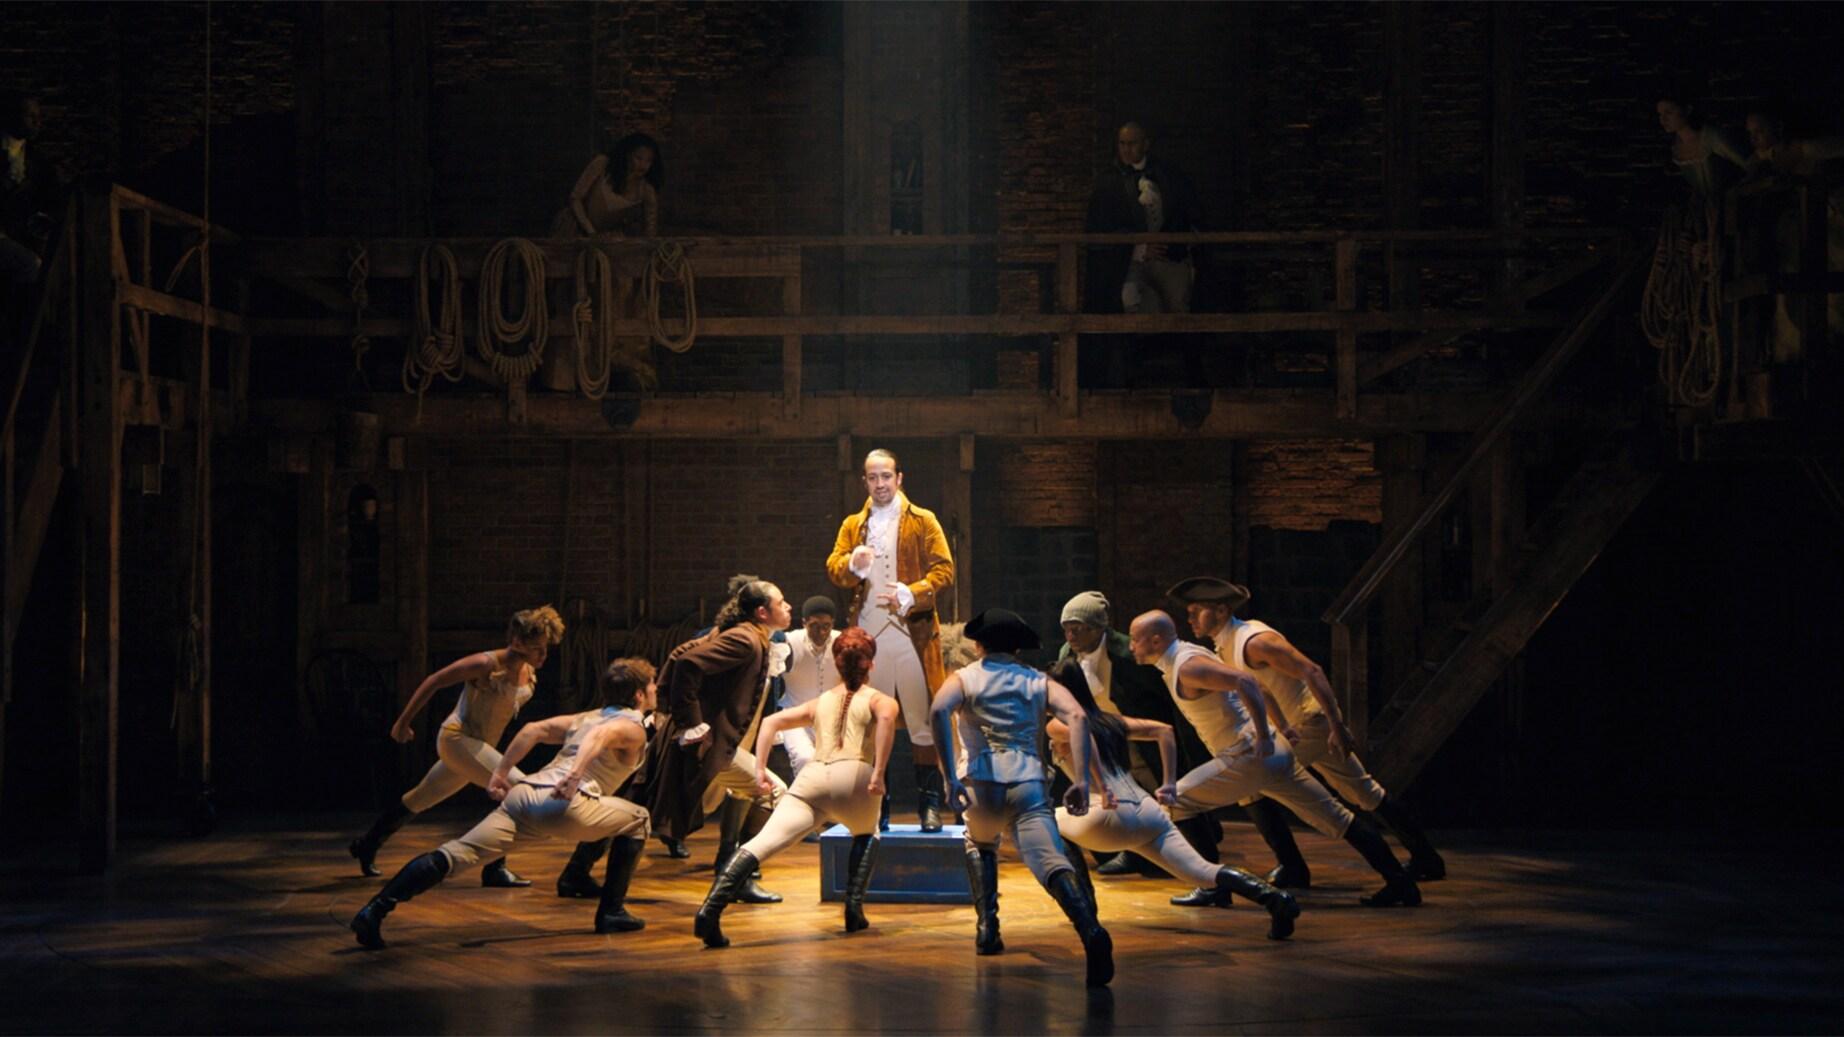 (L-R): Anthony Ramos is John Laurens, Lin-Manuel Miranda is Alexander Hamilton, and Okieriete Onaodowan is Hercules Mulligan in HAMILTON, the filmed version of the original Broadway production.